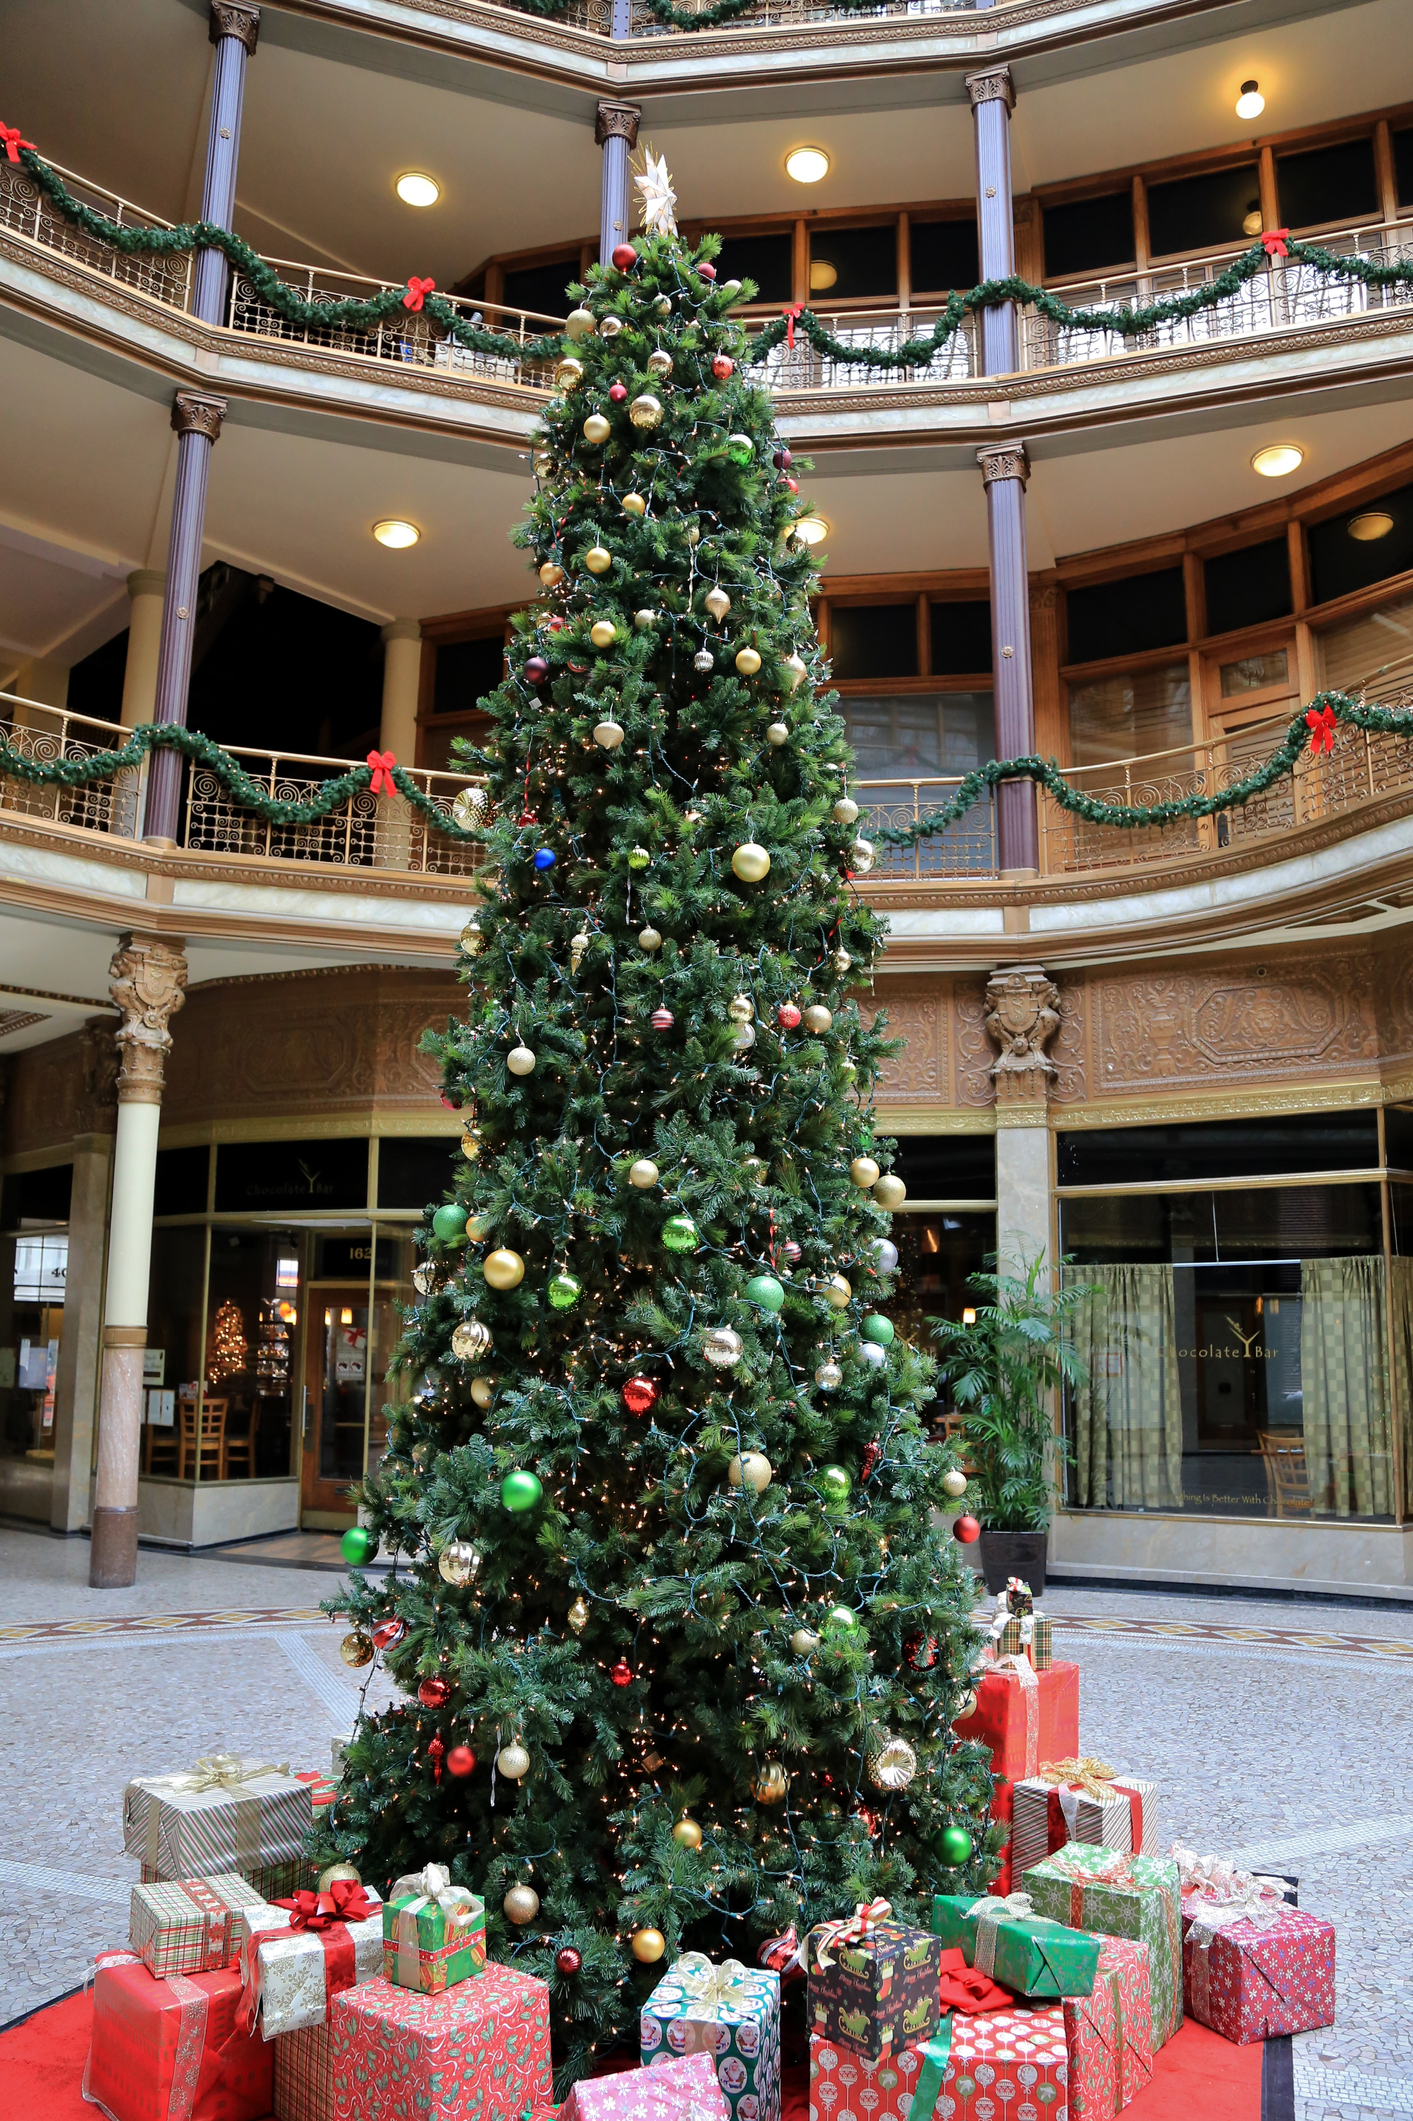 Christmas at the Historic Euclid Arcade retail shopping, Cleveland, Ohio, USA